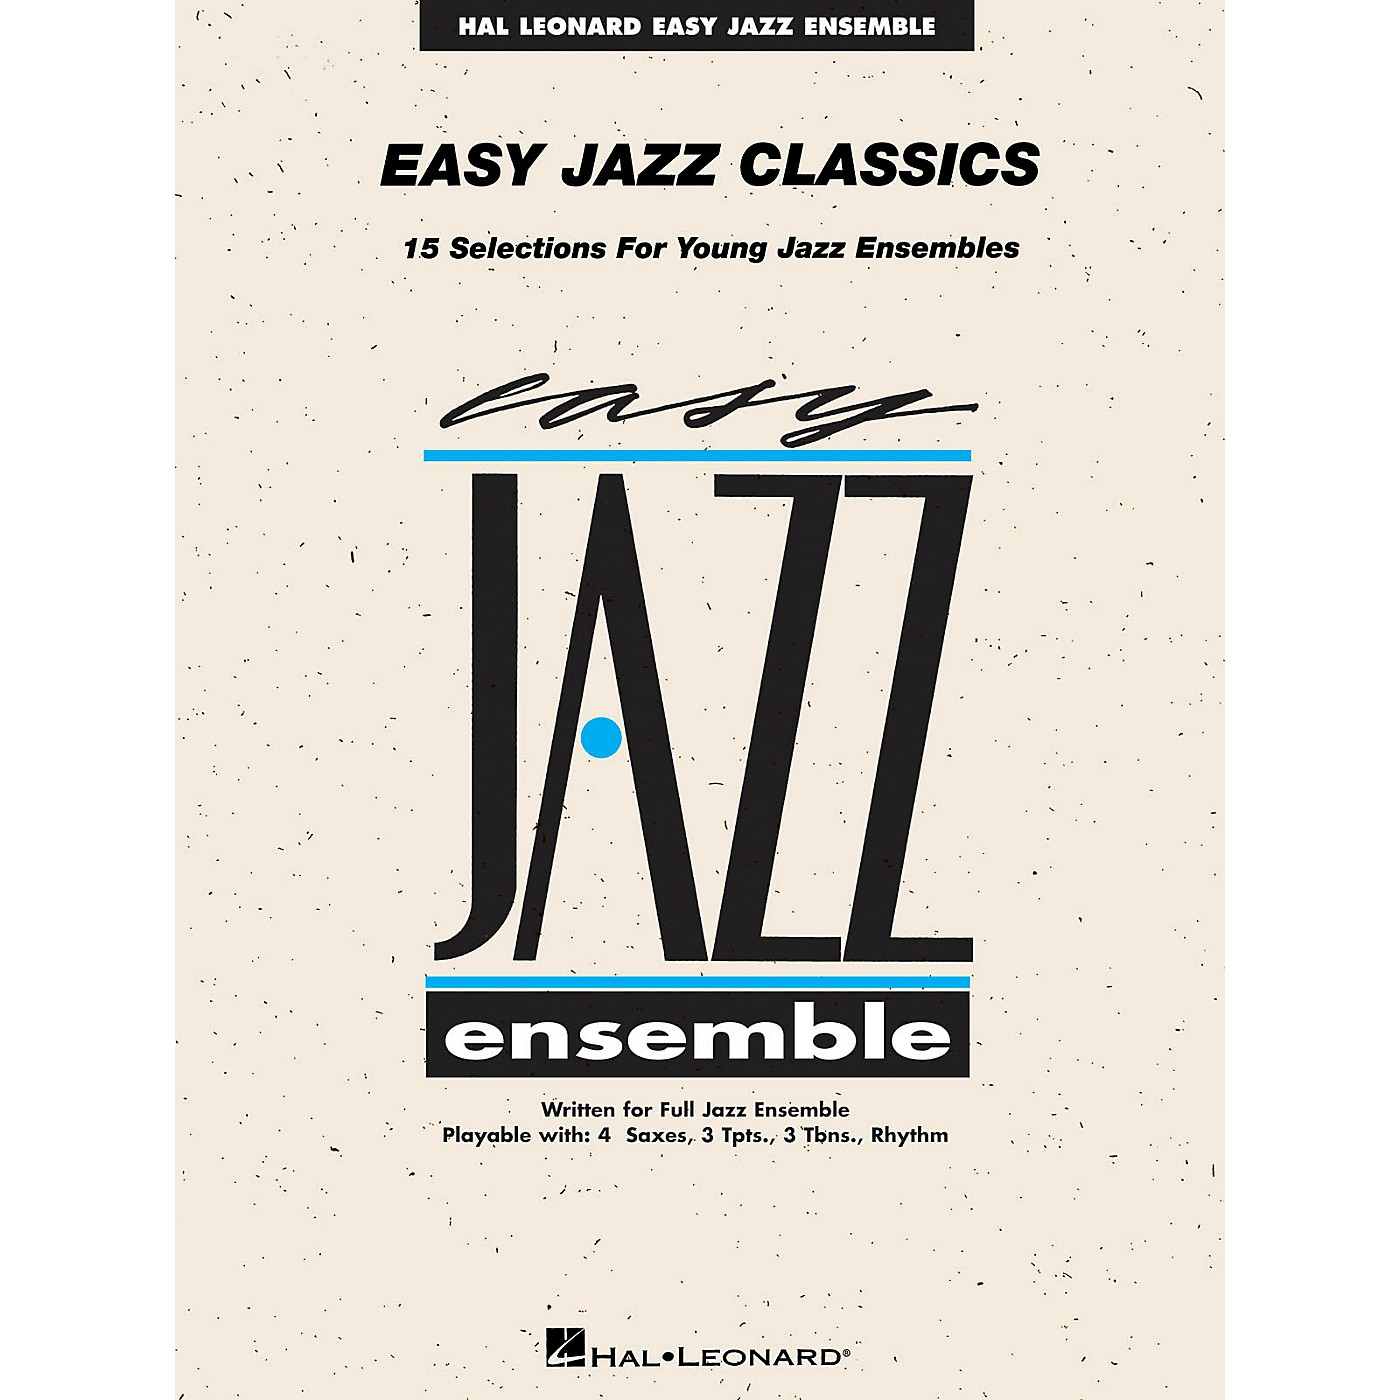 Hal Leonard Easy Jazz Classics - Trumpet 1 Jazz Band Level 2 thumbnail